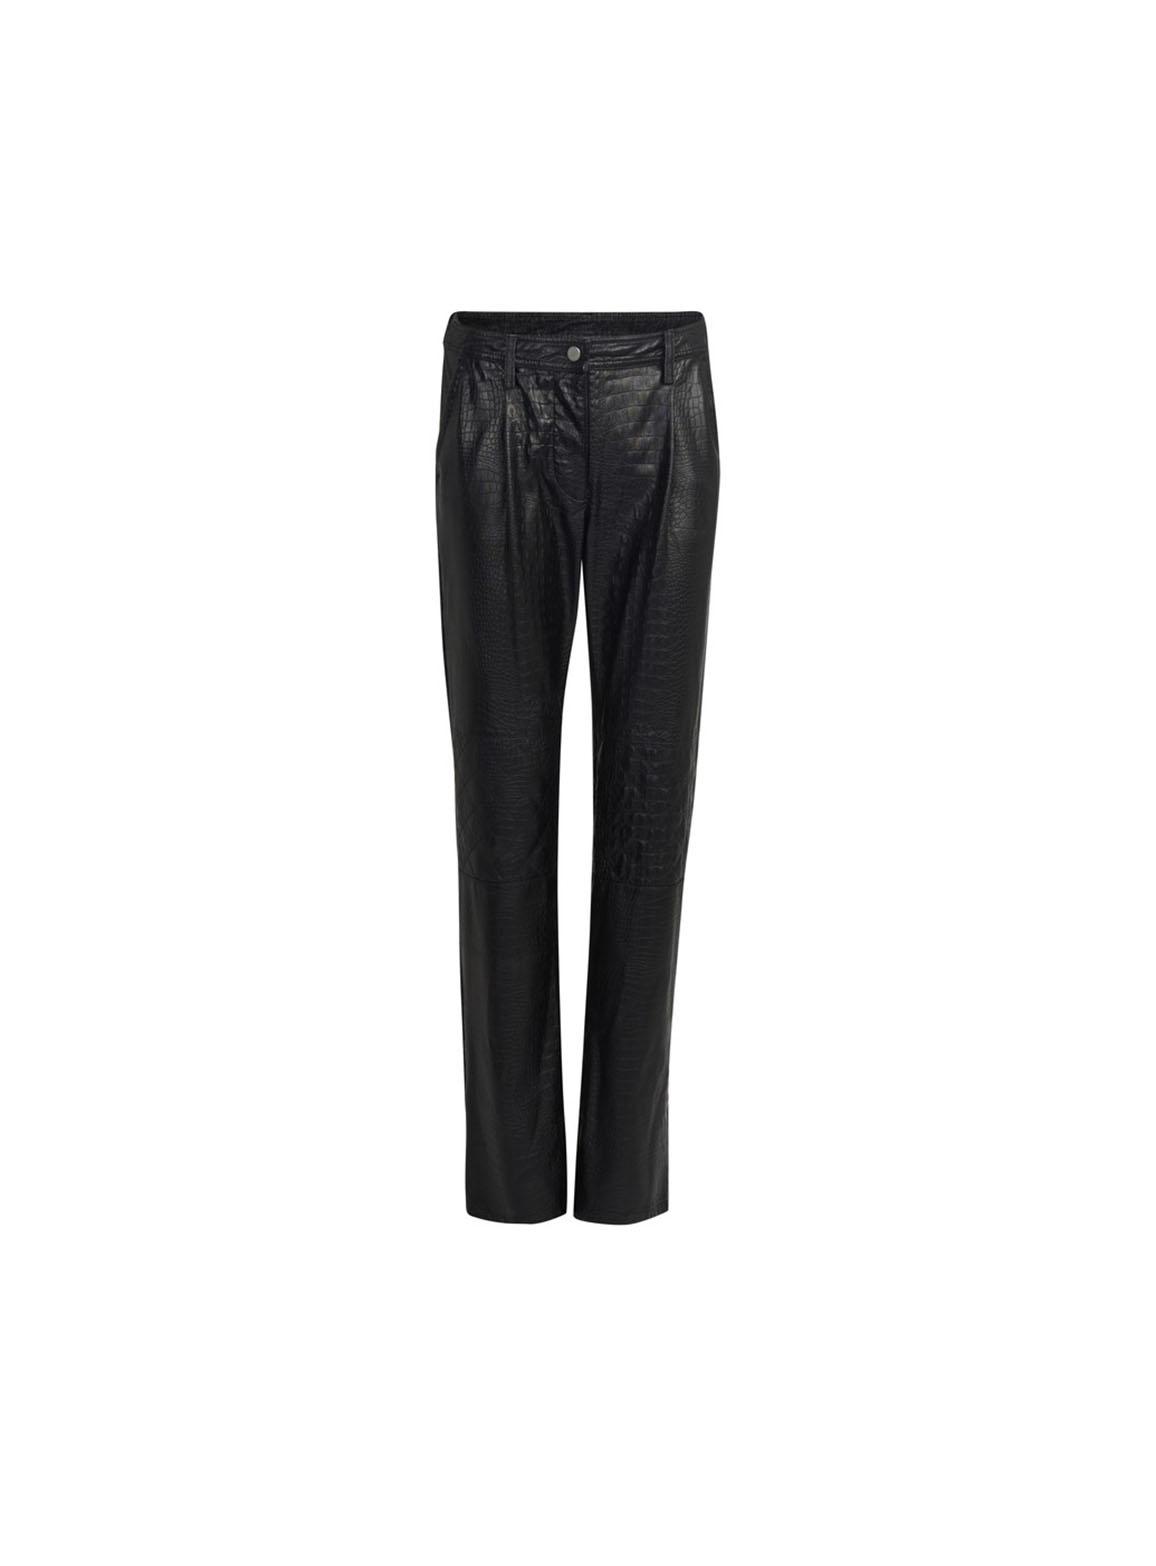 Croco effect pants